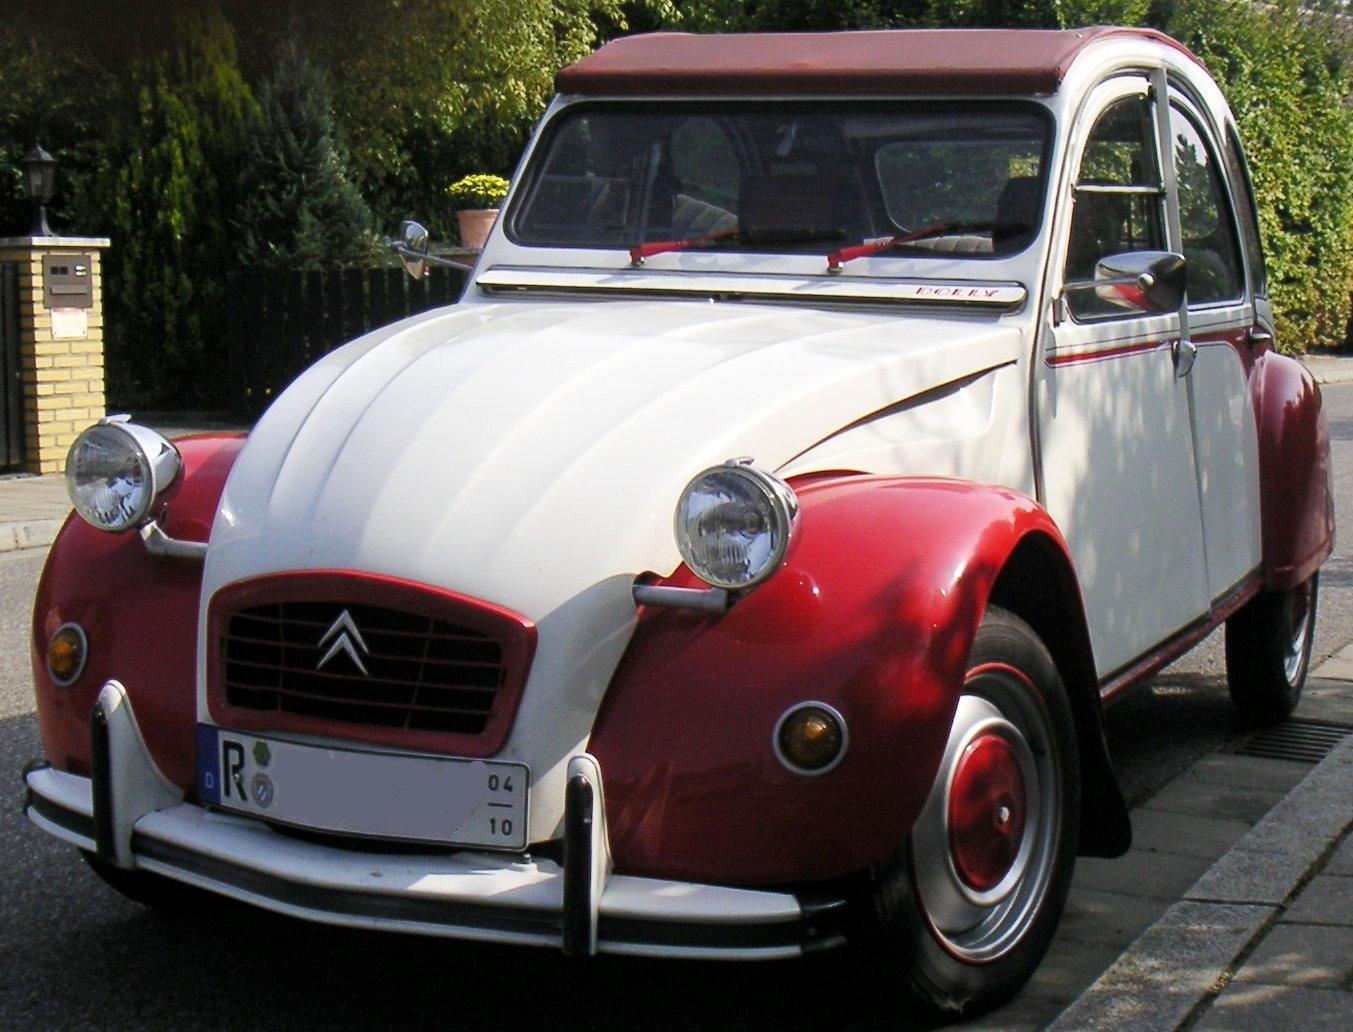 White Duck Car Wash Manchester Nh